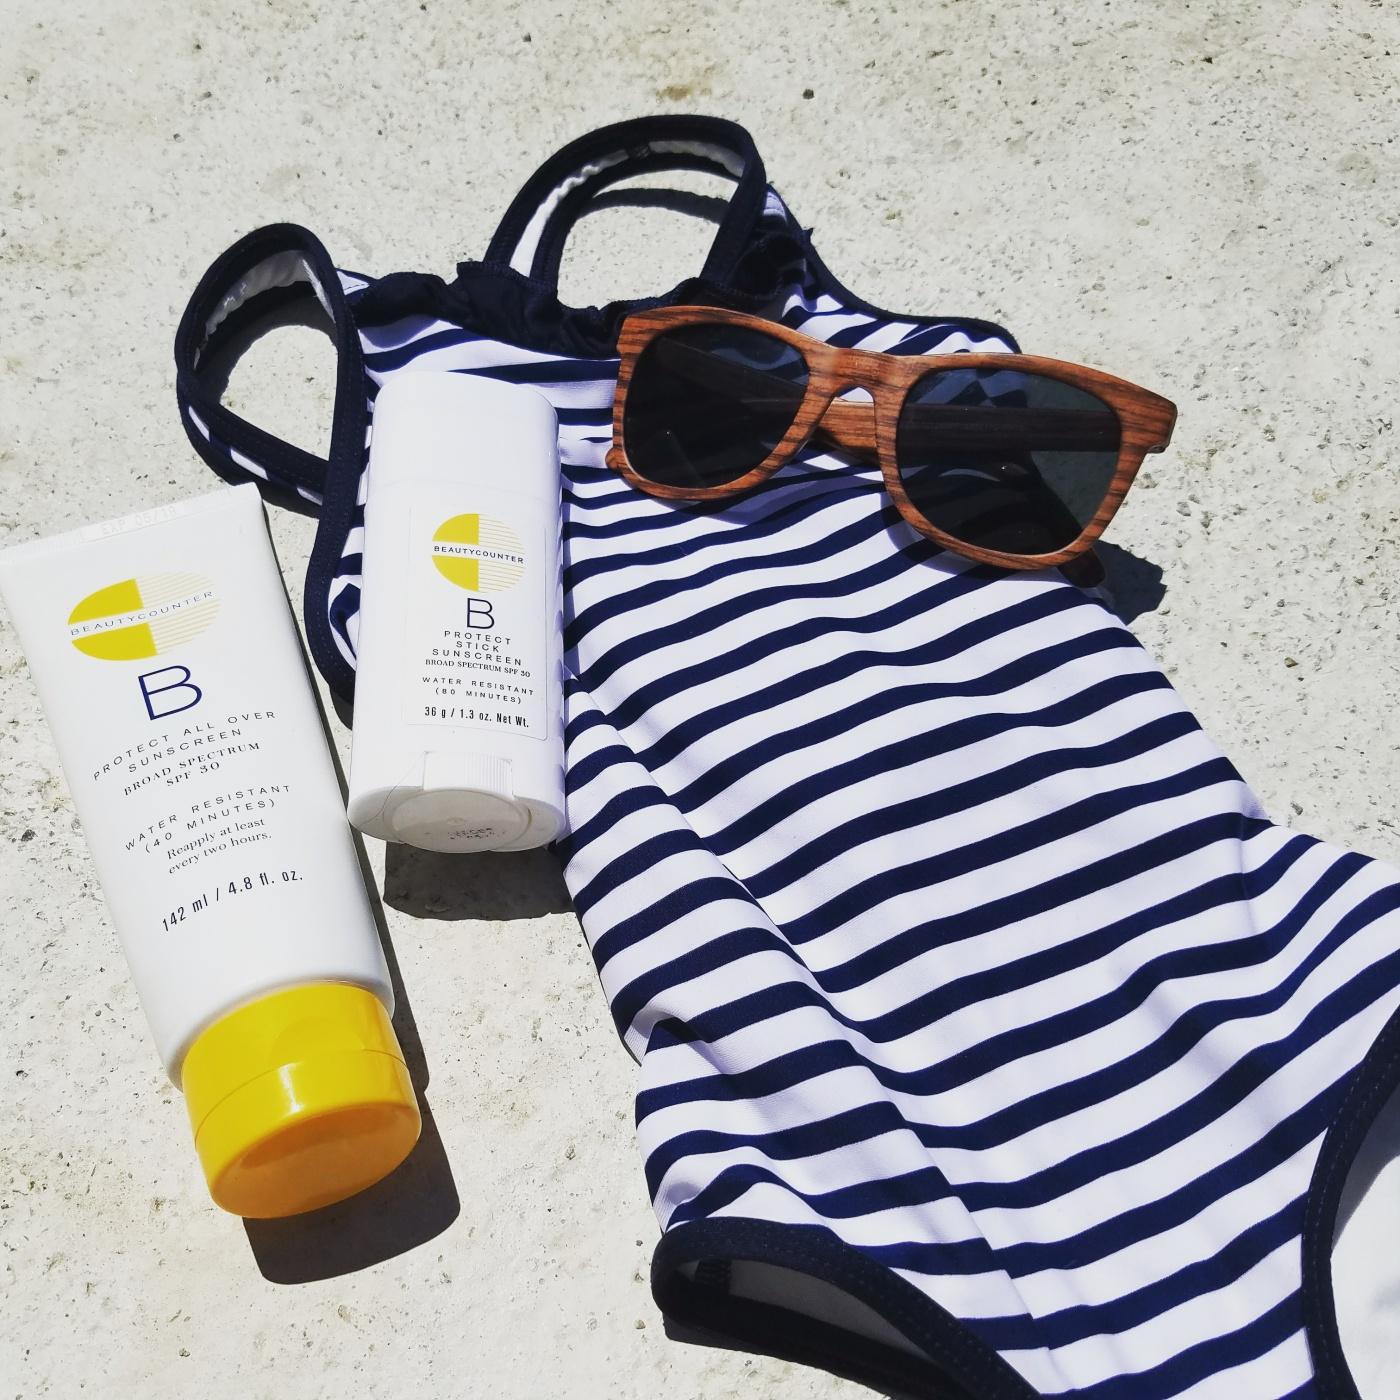 Better Beauty Vermont Beautycounter sunscreen toddler swimsuit sunglasses